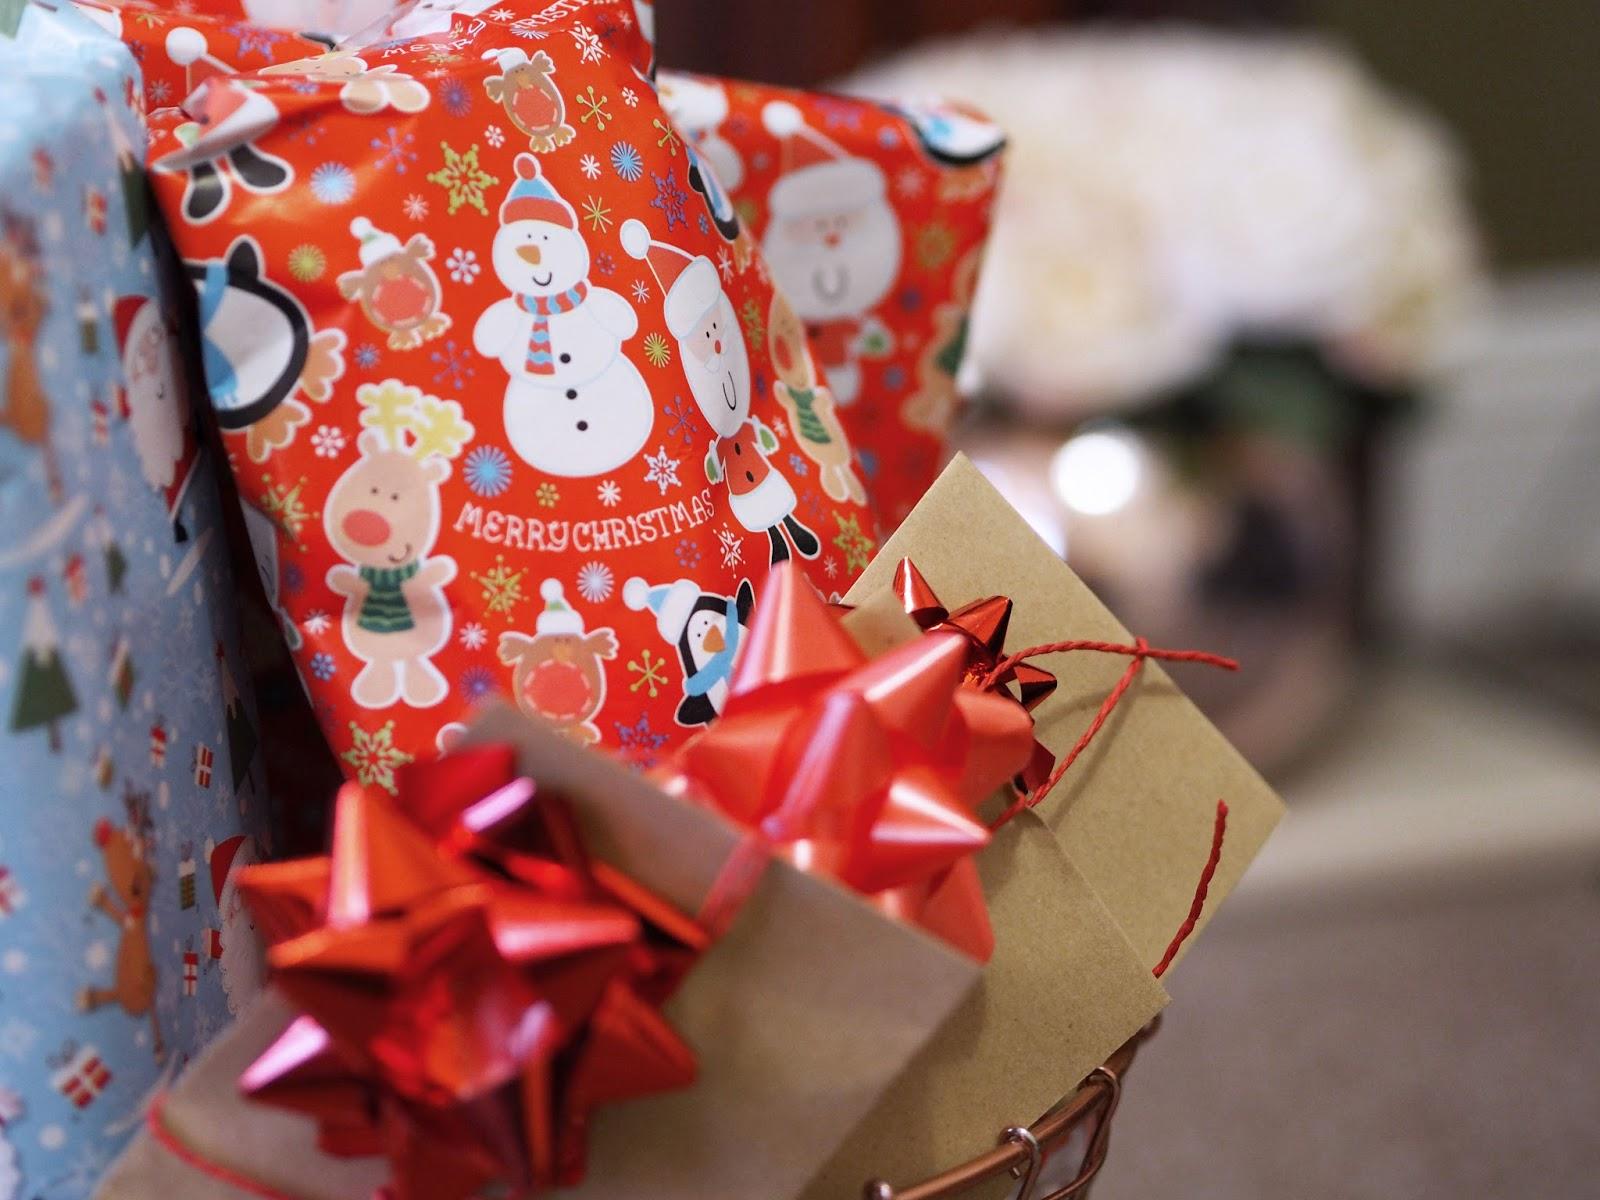 Wrap up your favourite Christmas Films to unwrap on Movie Night